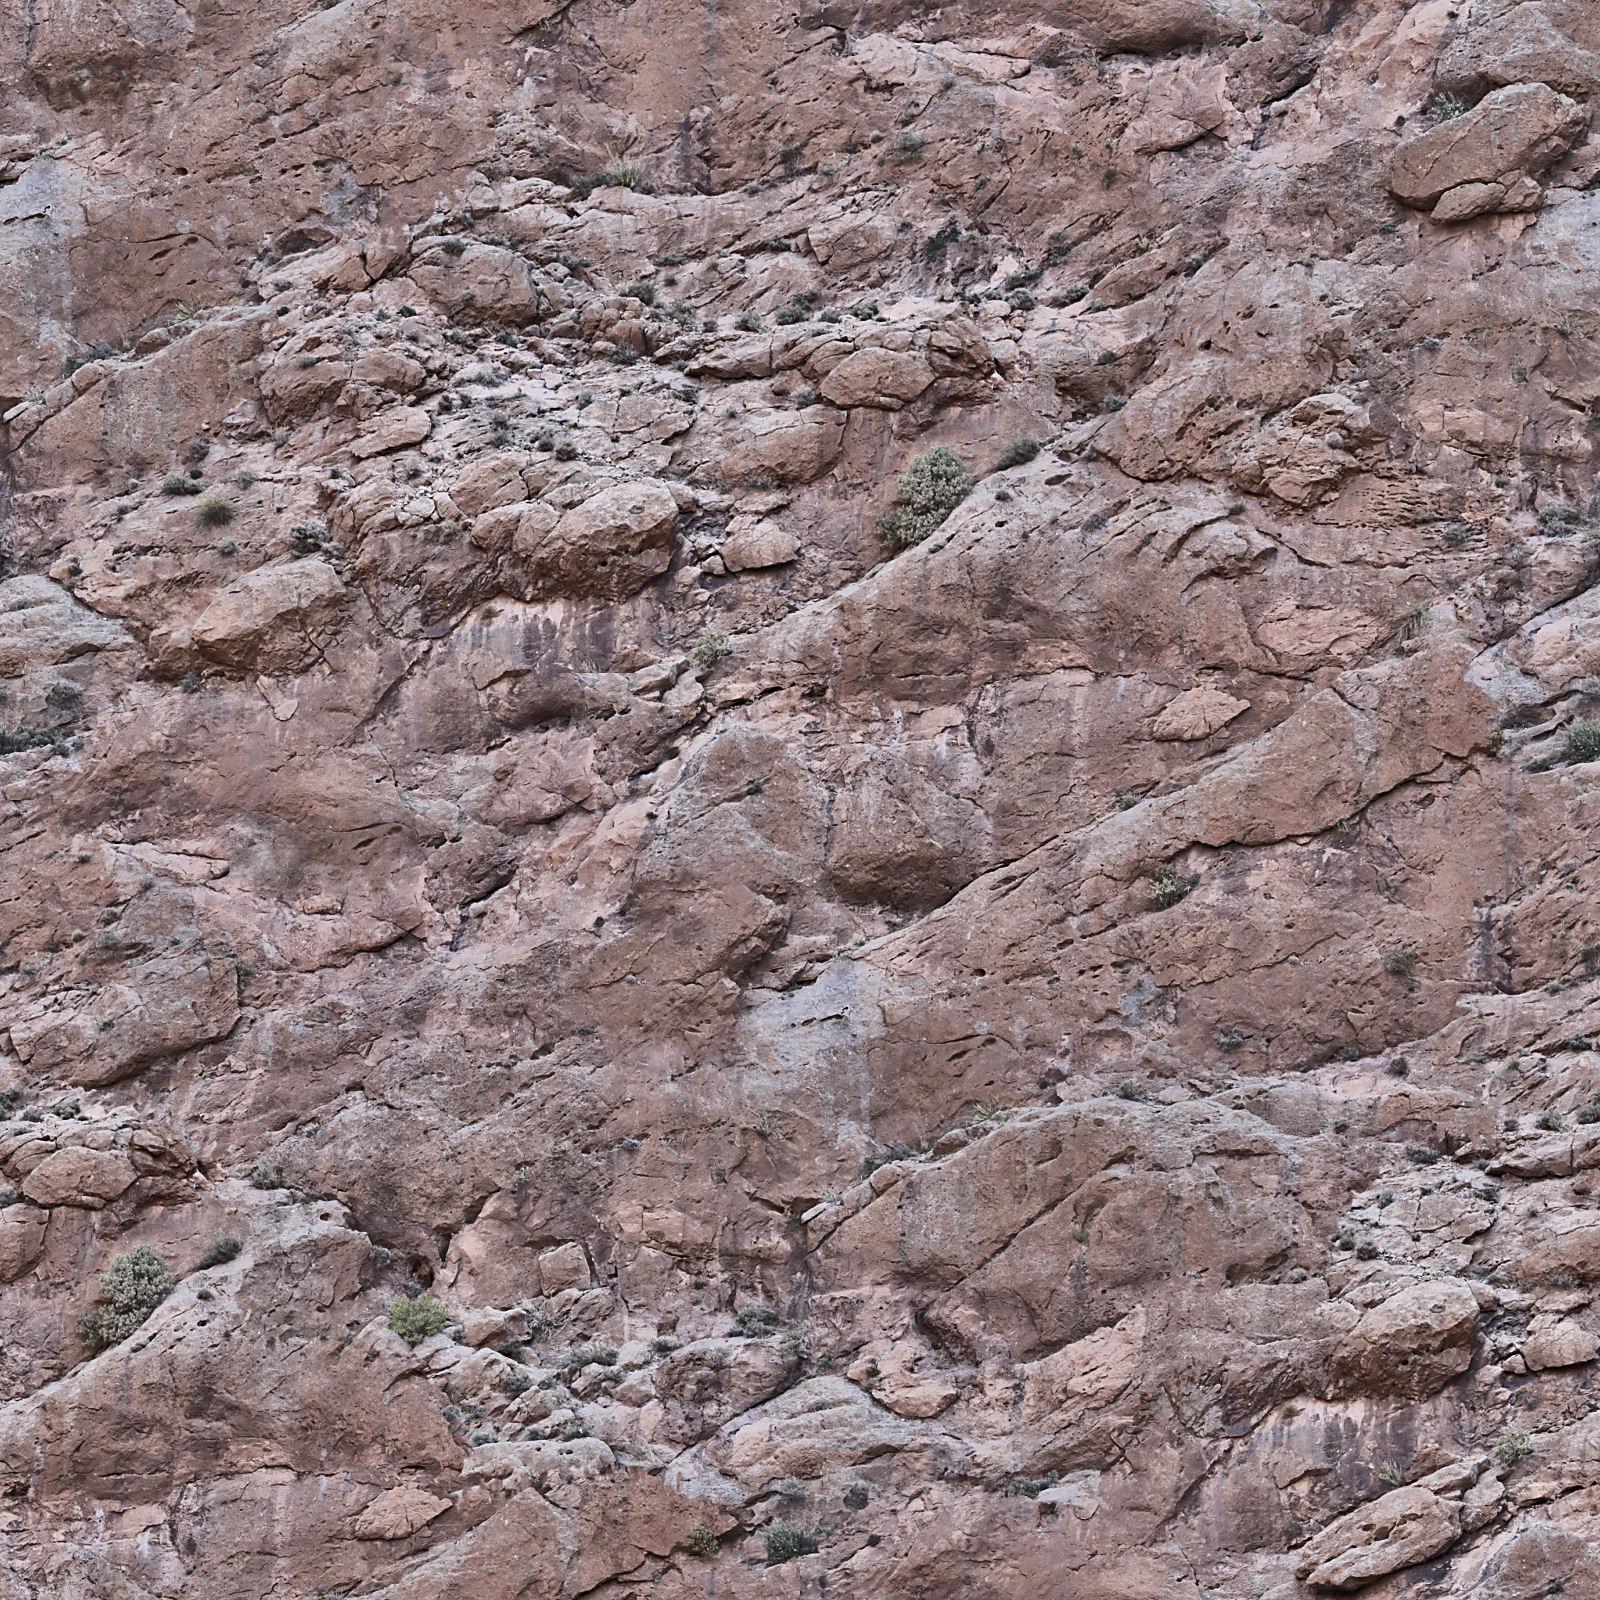 HIGH RESOLUTION TEXTURES: Seamless rock mountain face texture